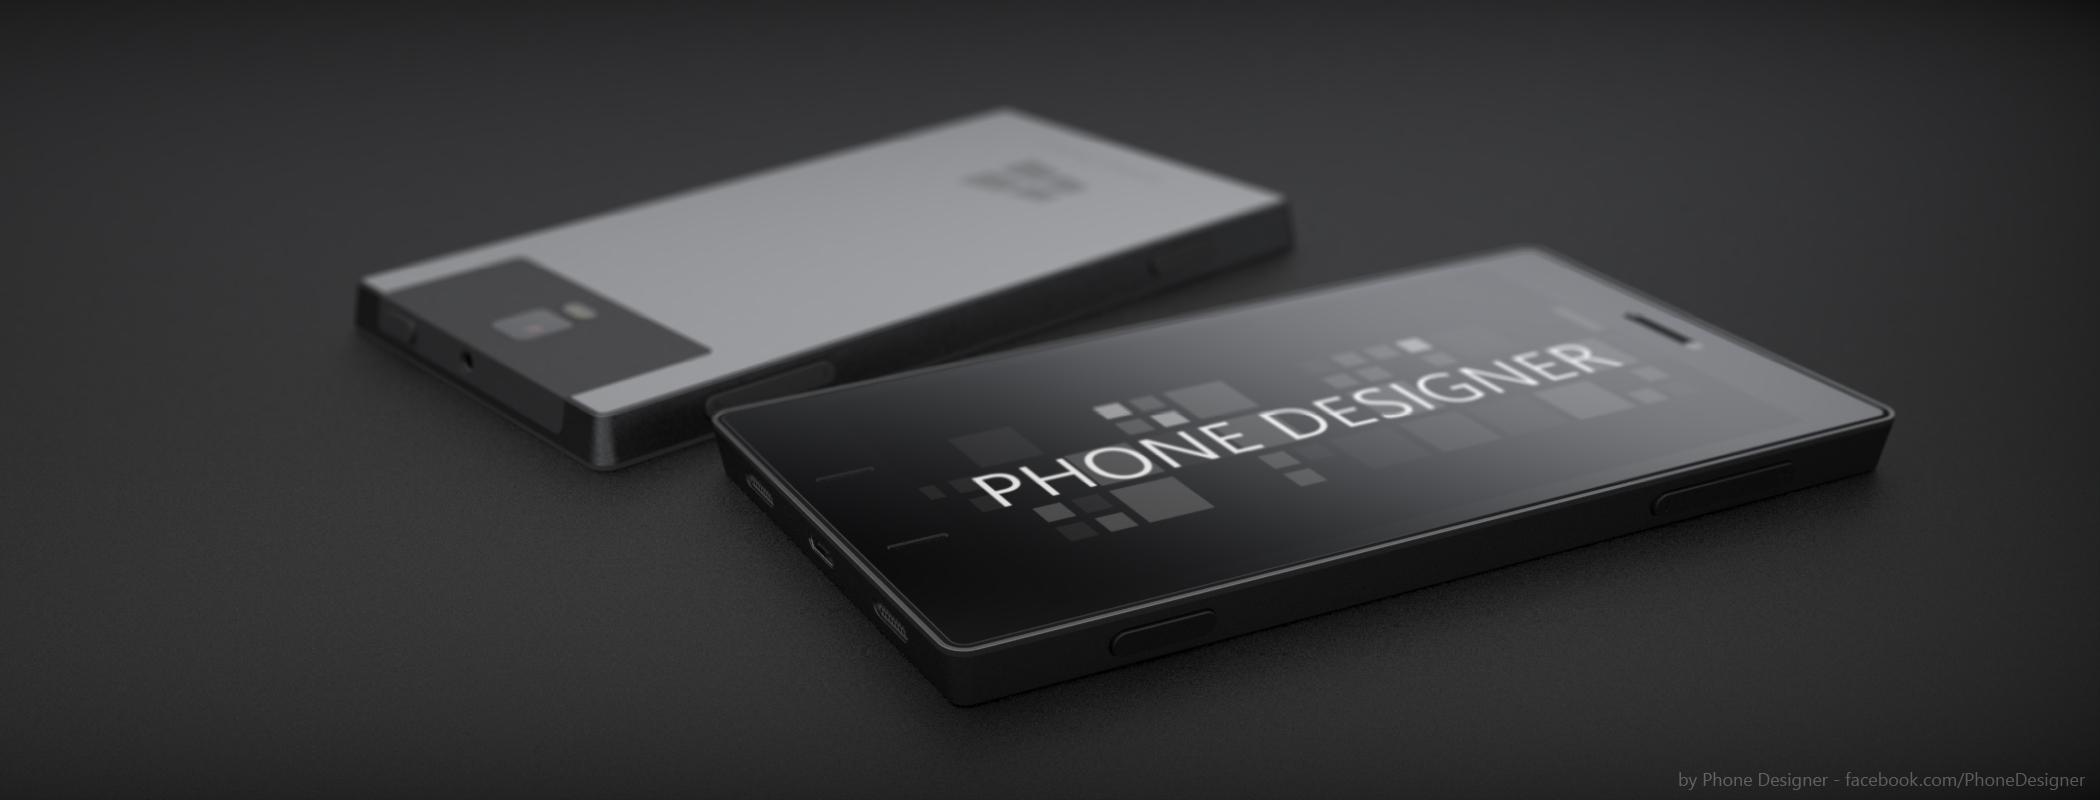 Surface Phone by Jonas-Daehnert